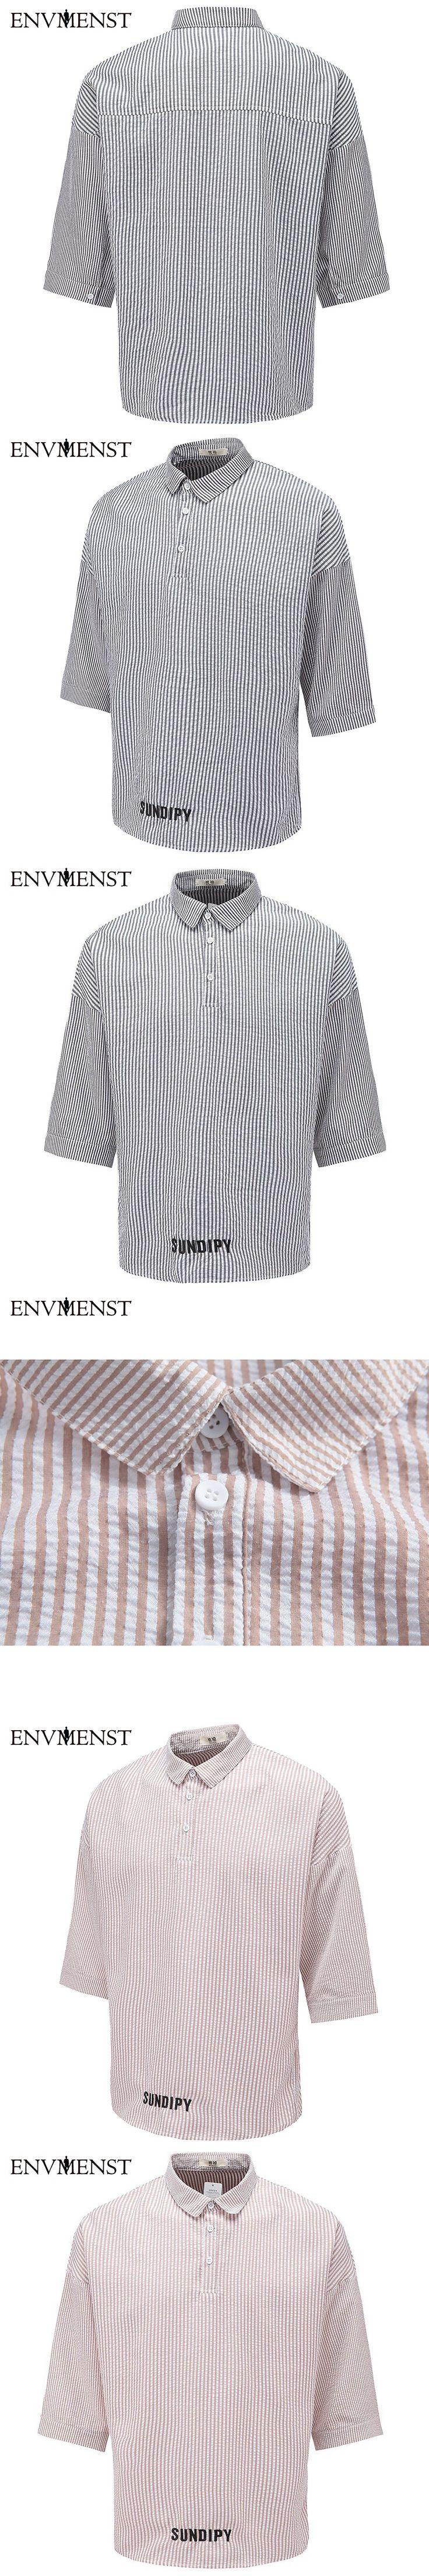 2017 Men Shirts Chinese style Cotton shirts men camisas hombre vestir Male blouse Half sleeve casual Striped shirt men clothing